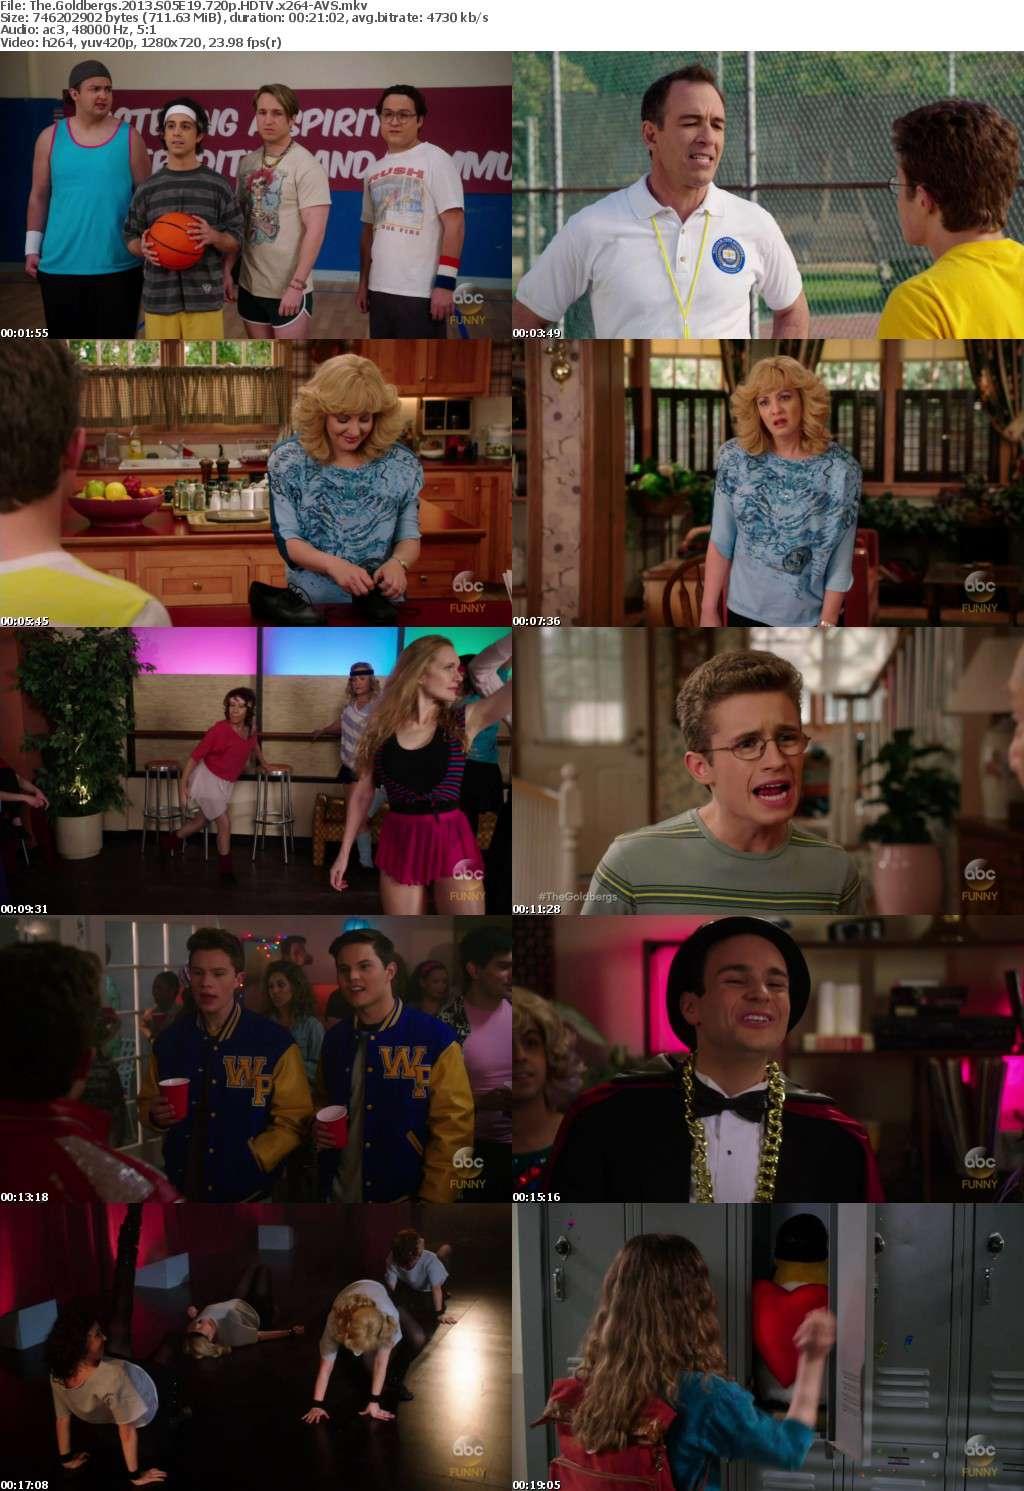 The Goldbergs 2013 S05E19 720p HDTV x264-AVS